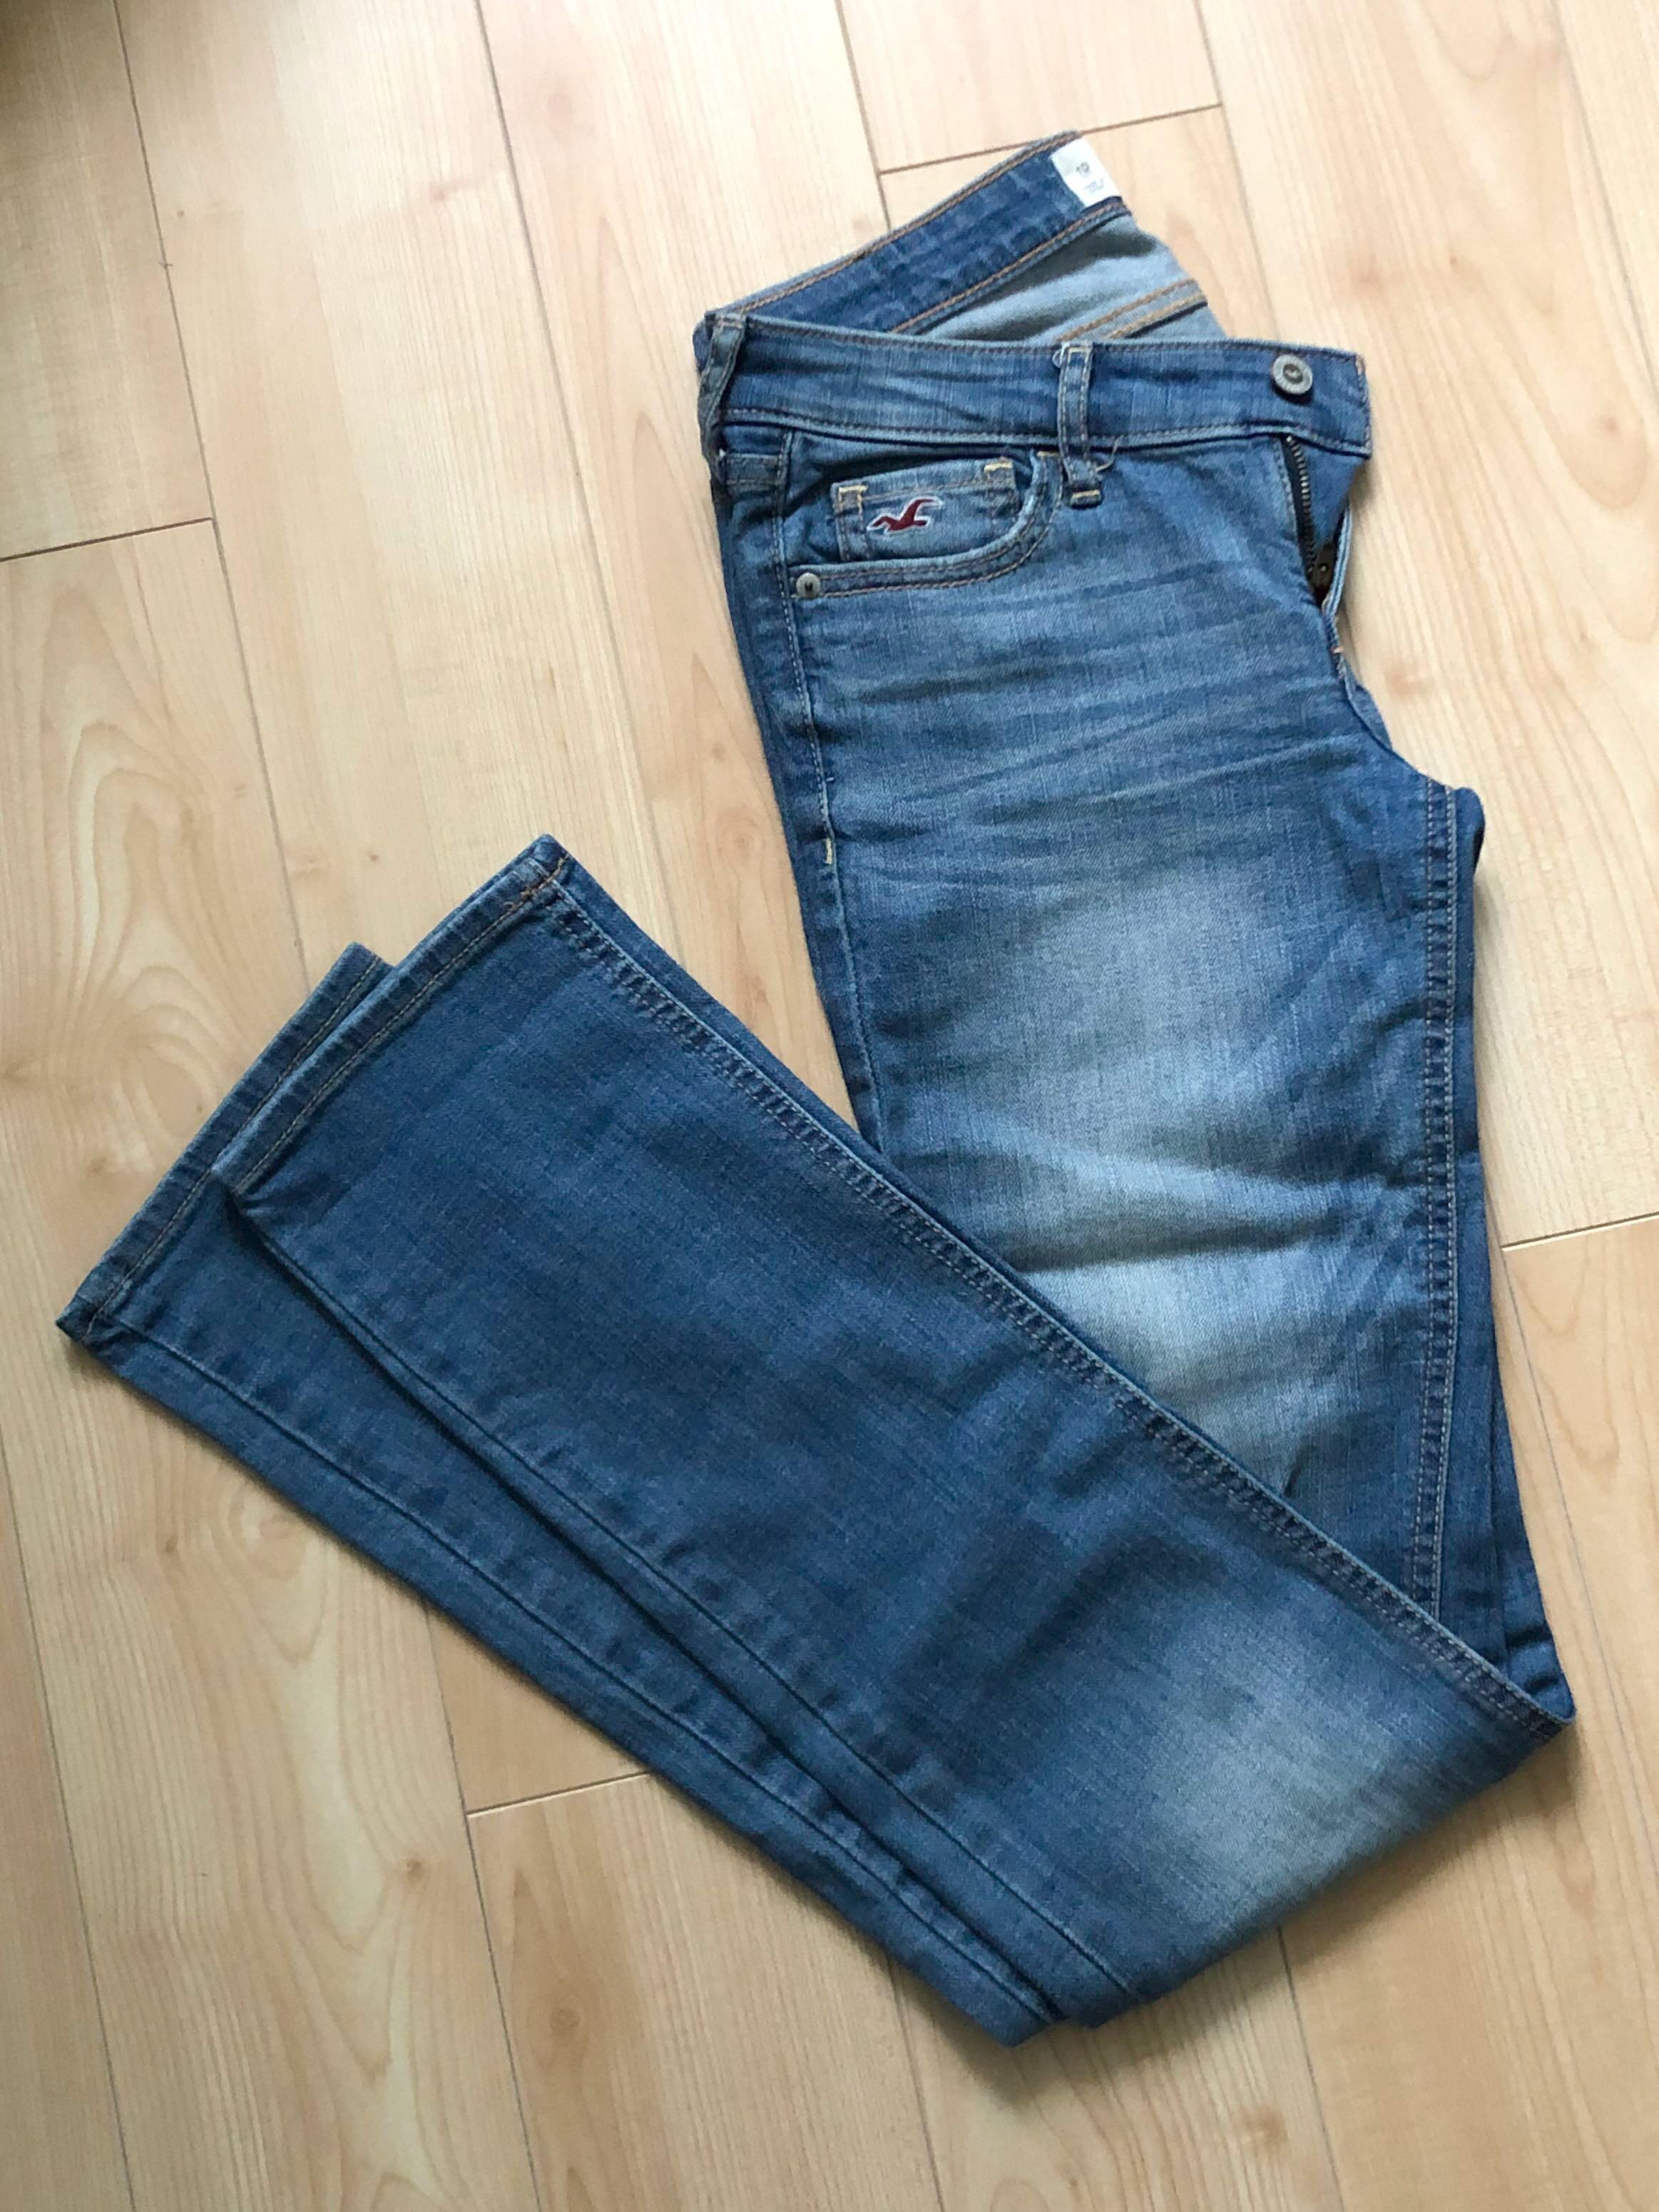 Hollister light wash straight jeans